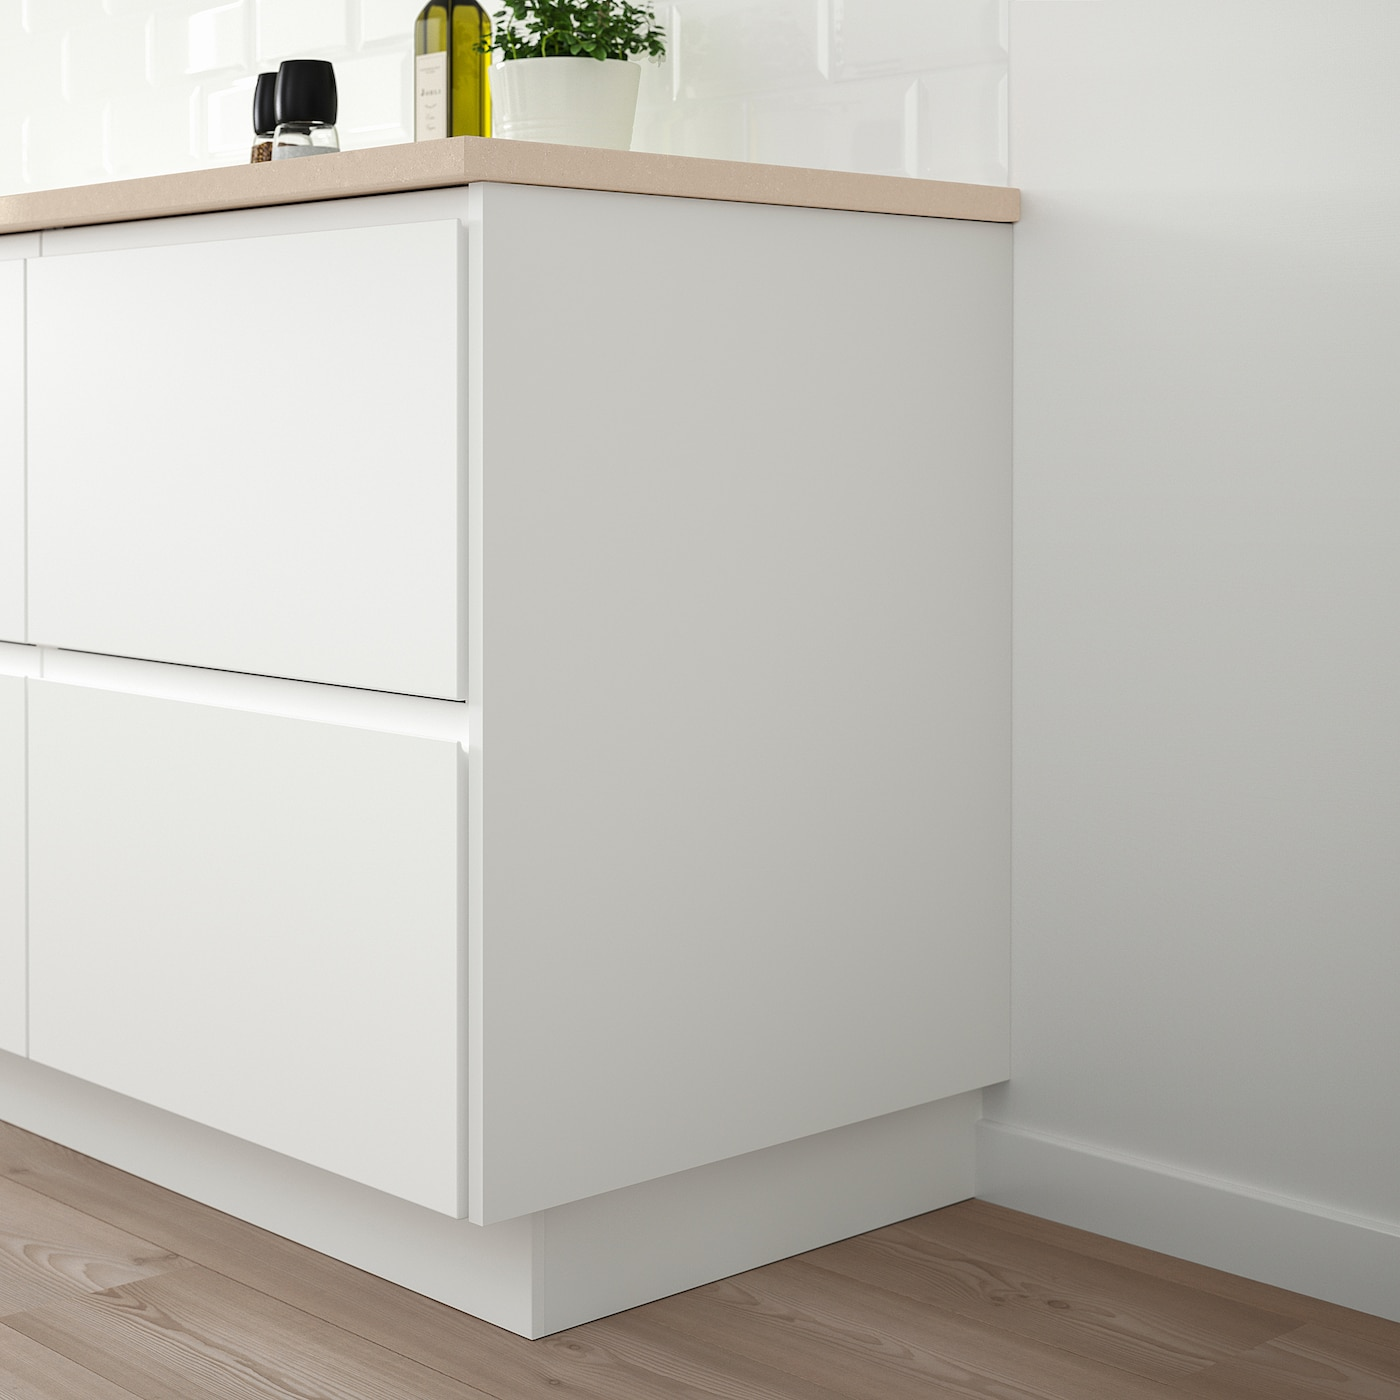 SEKTION Kitchen Cabinet Cover Panels & Deco Strips - IKEA